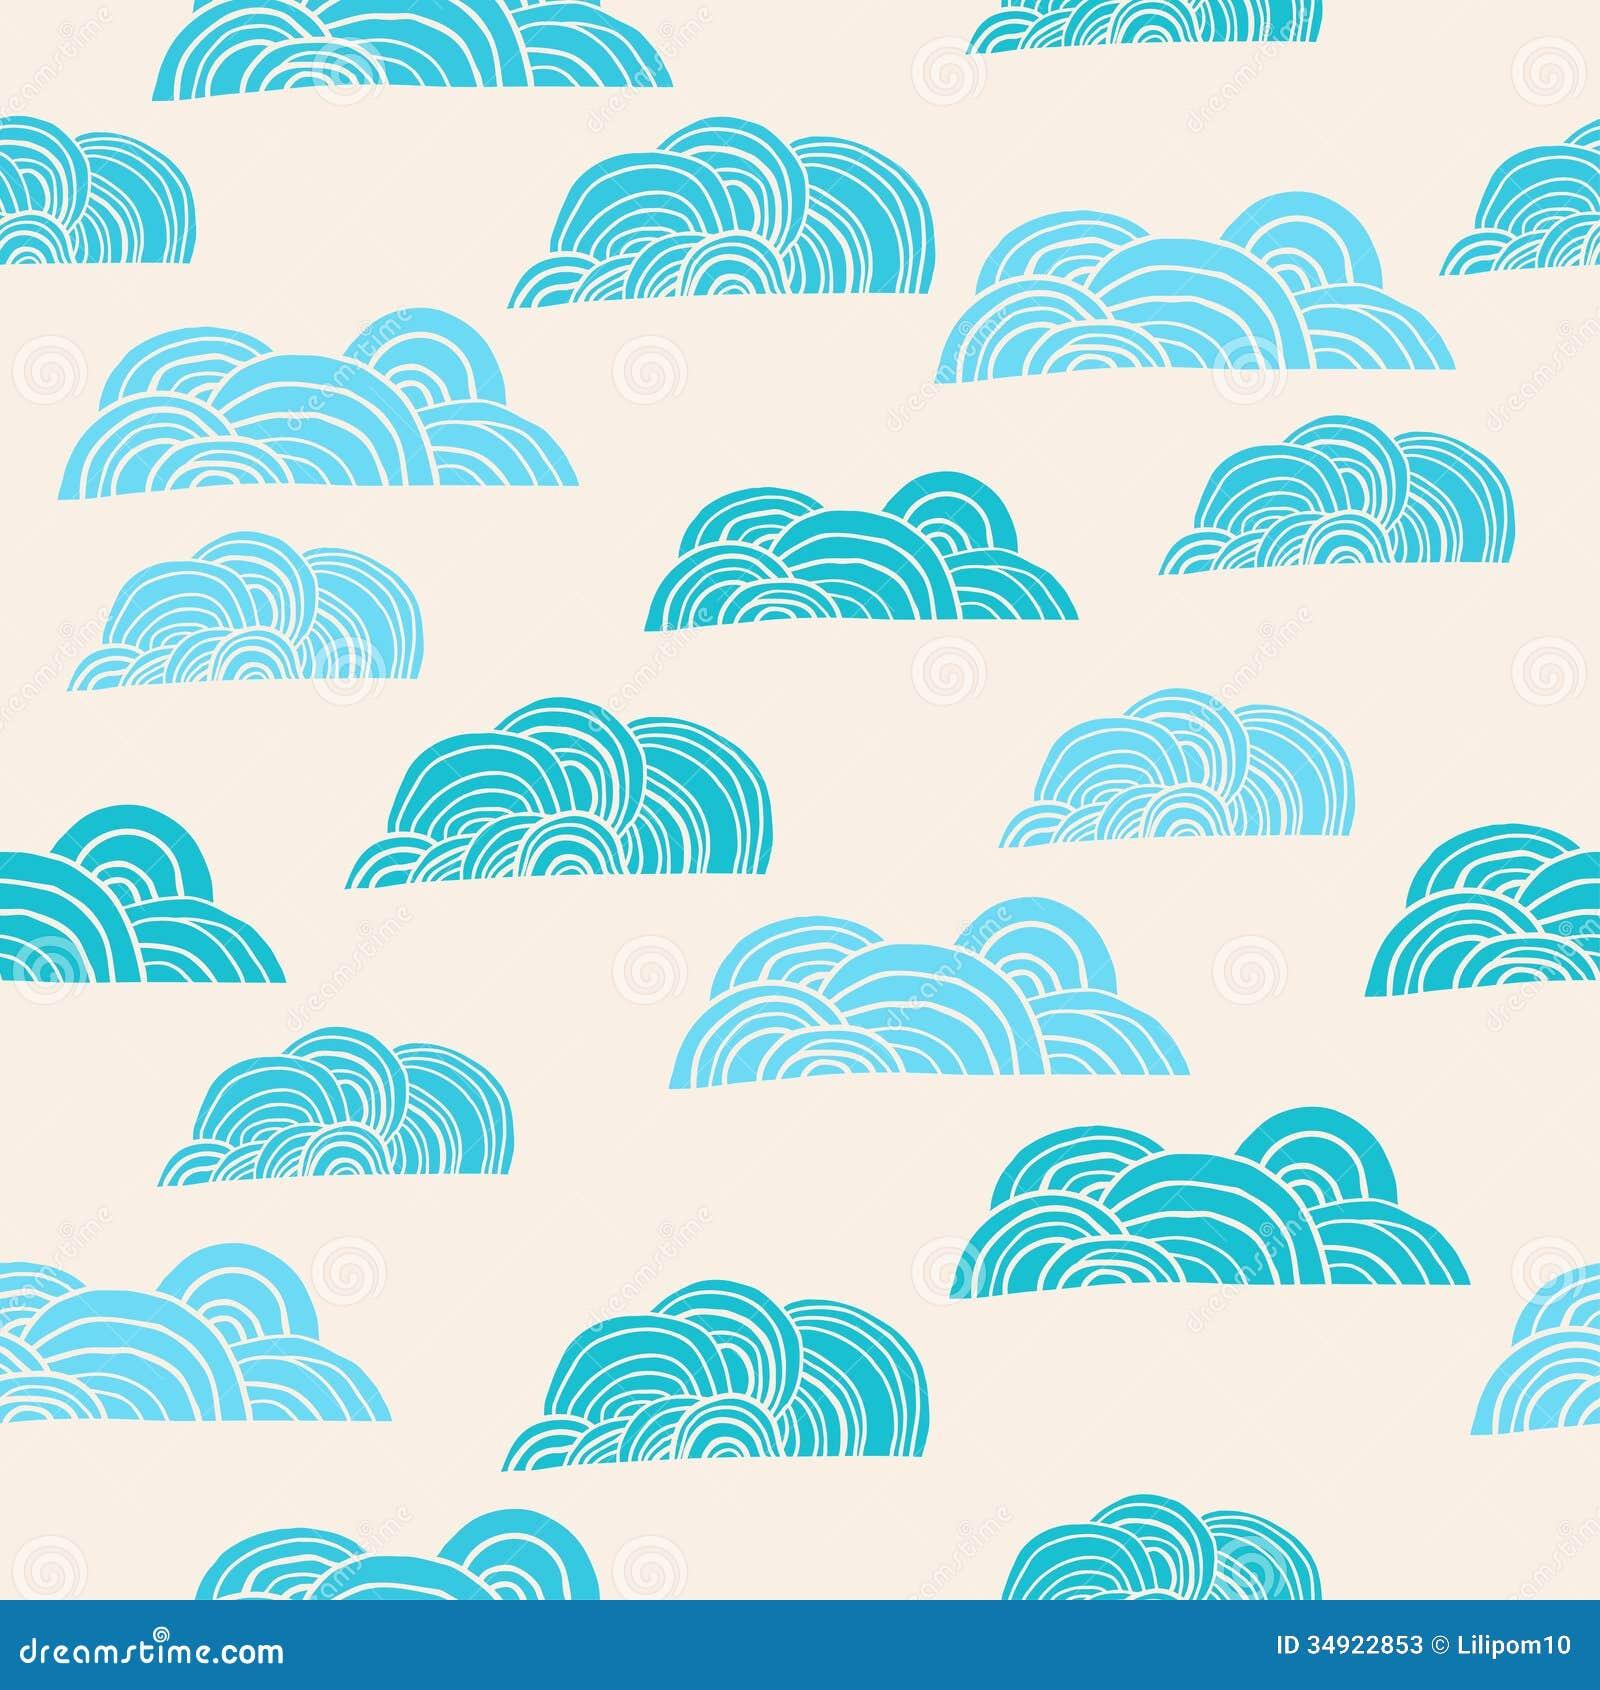 Cloud Design Patterns Poster